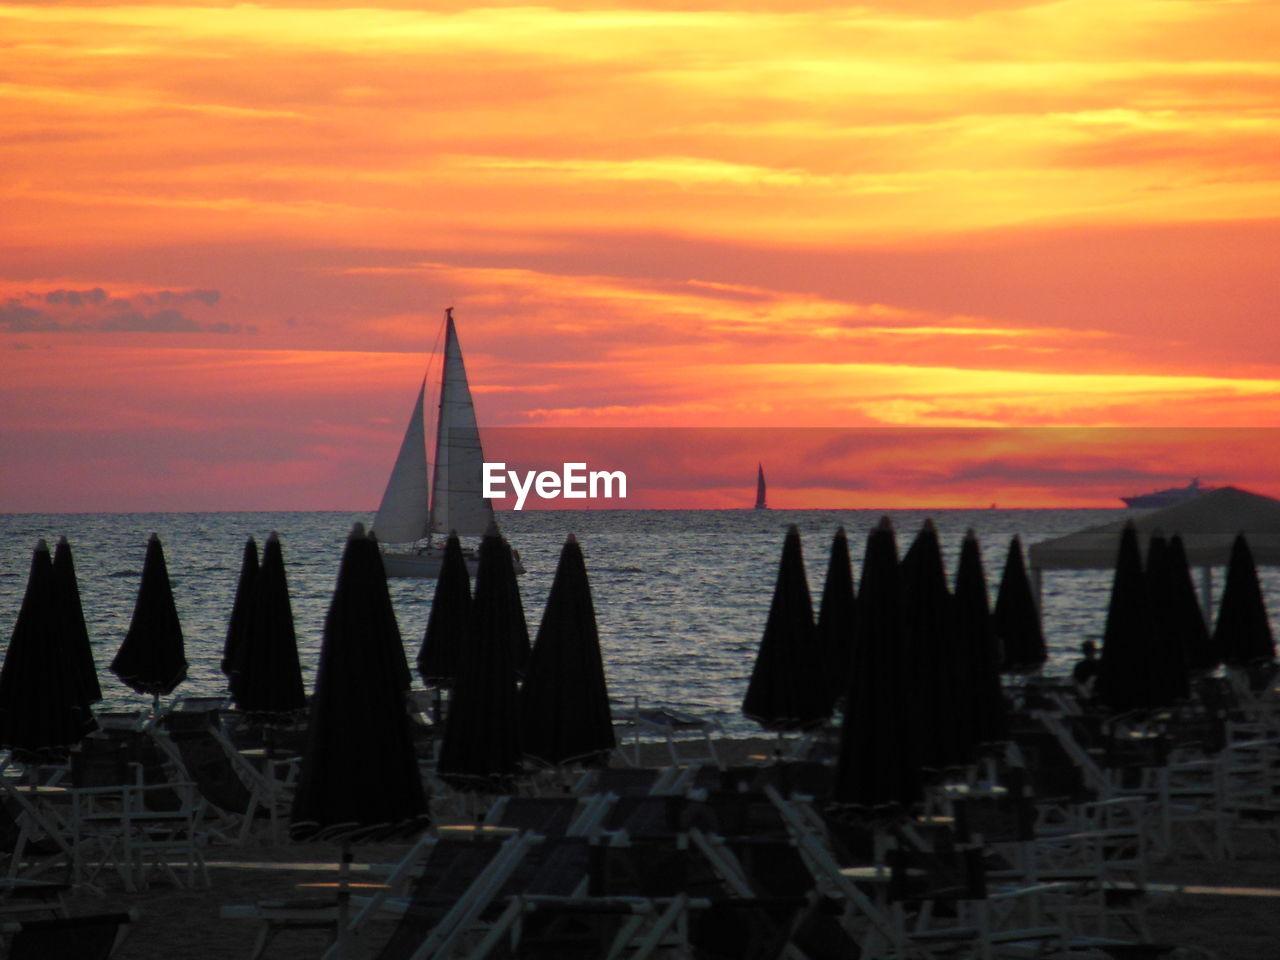 Silhouette parasols by sea against orange sky